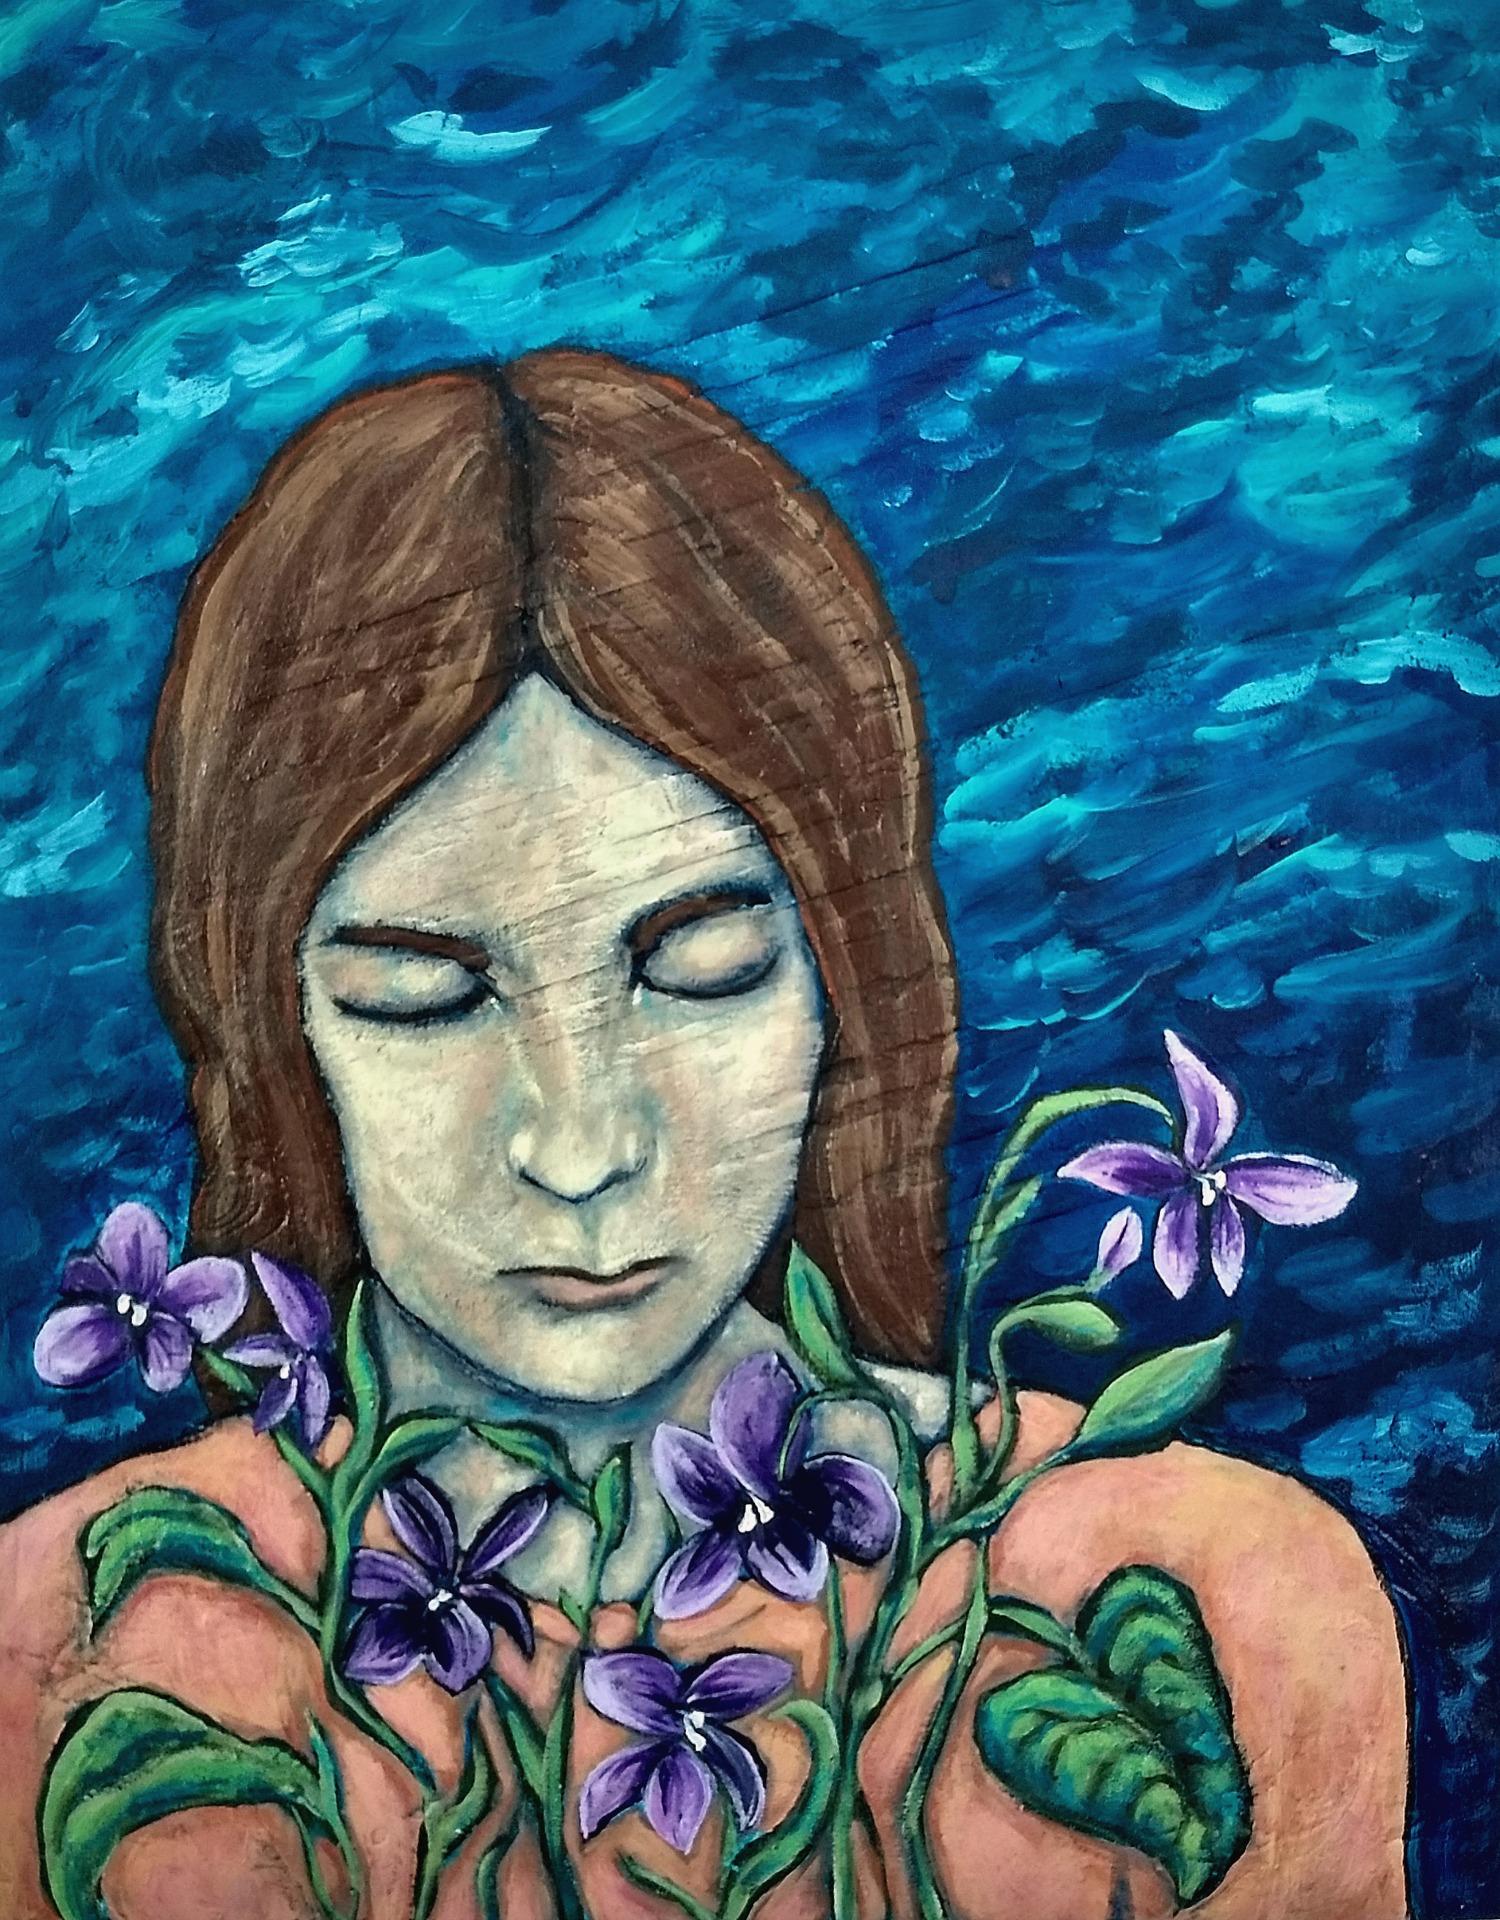 mixed-media portrait on panel by Hali Karla